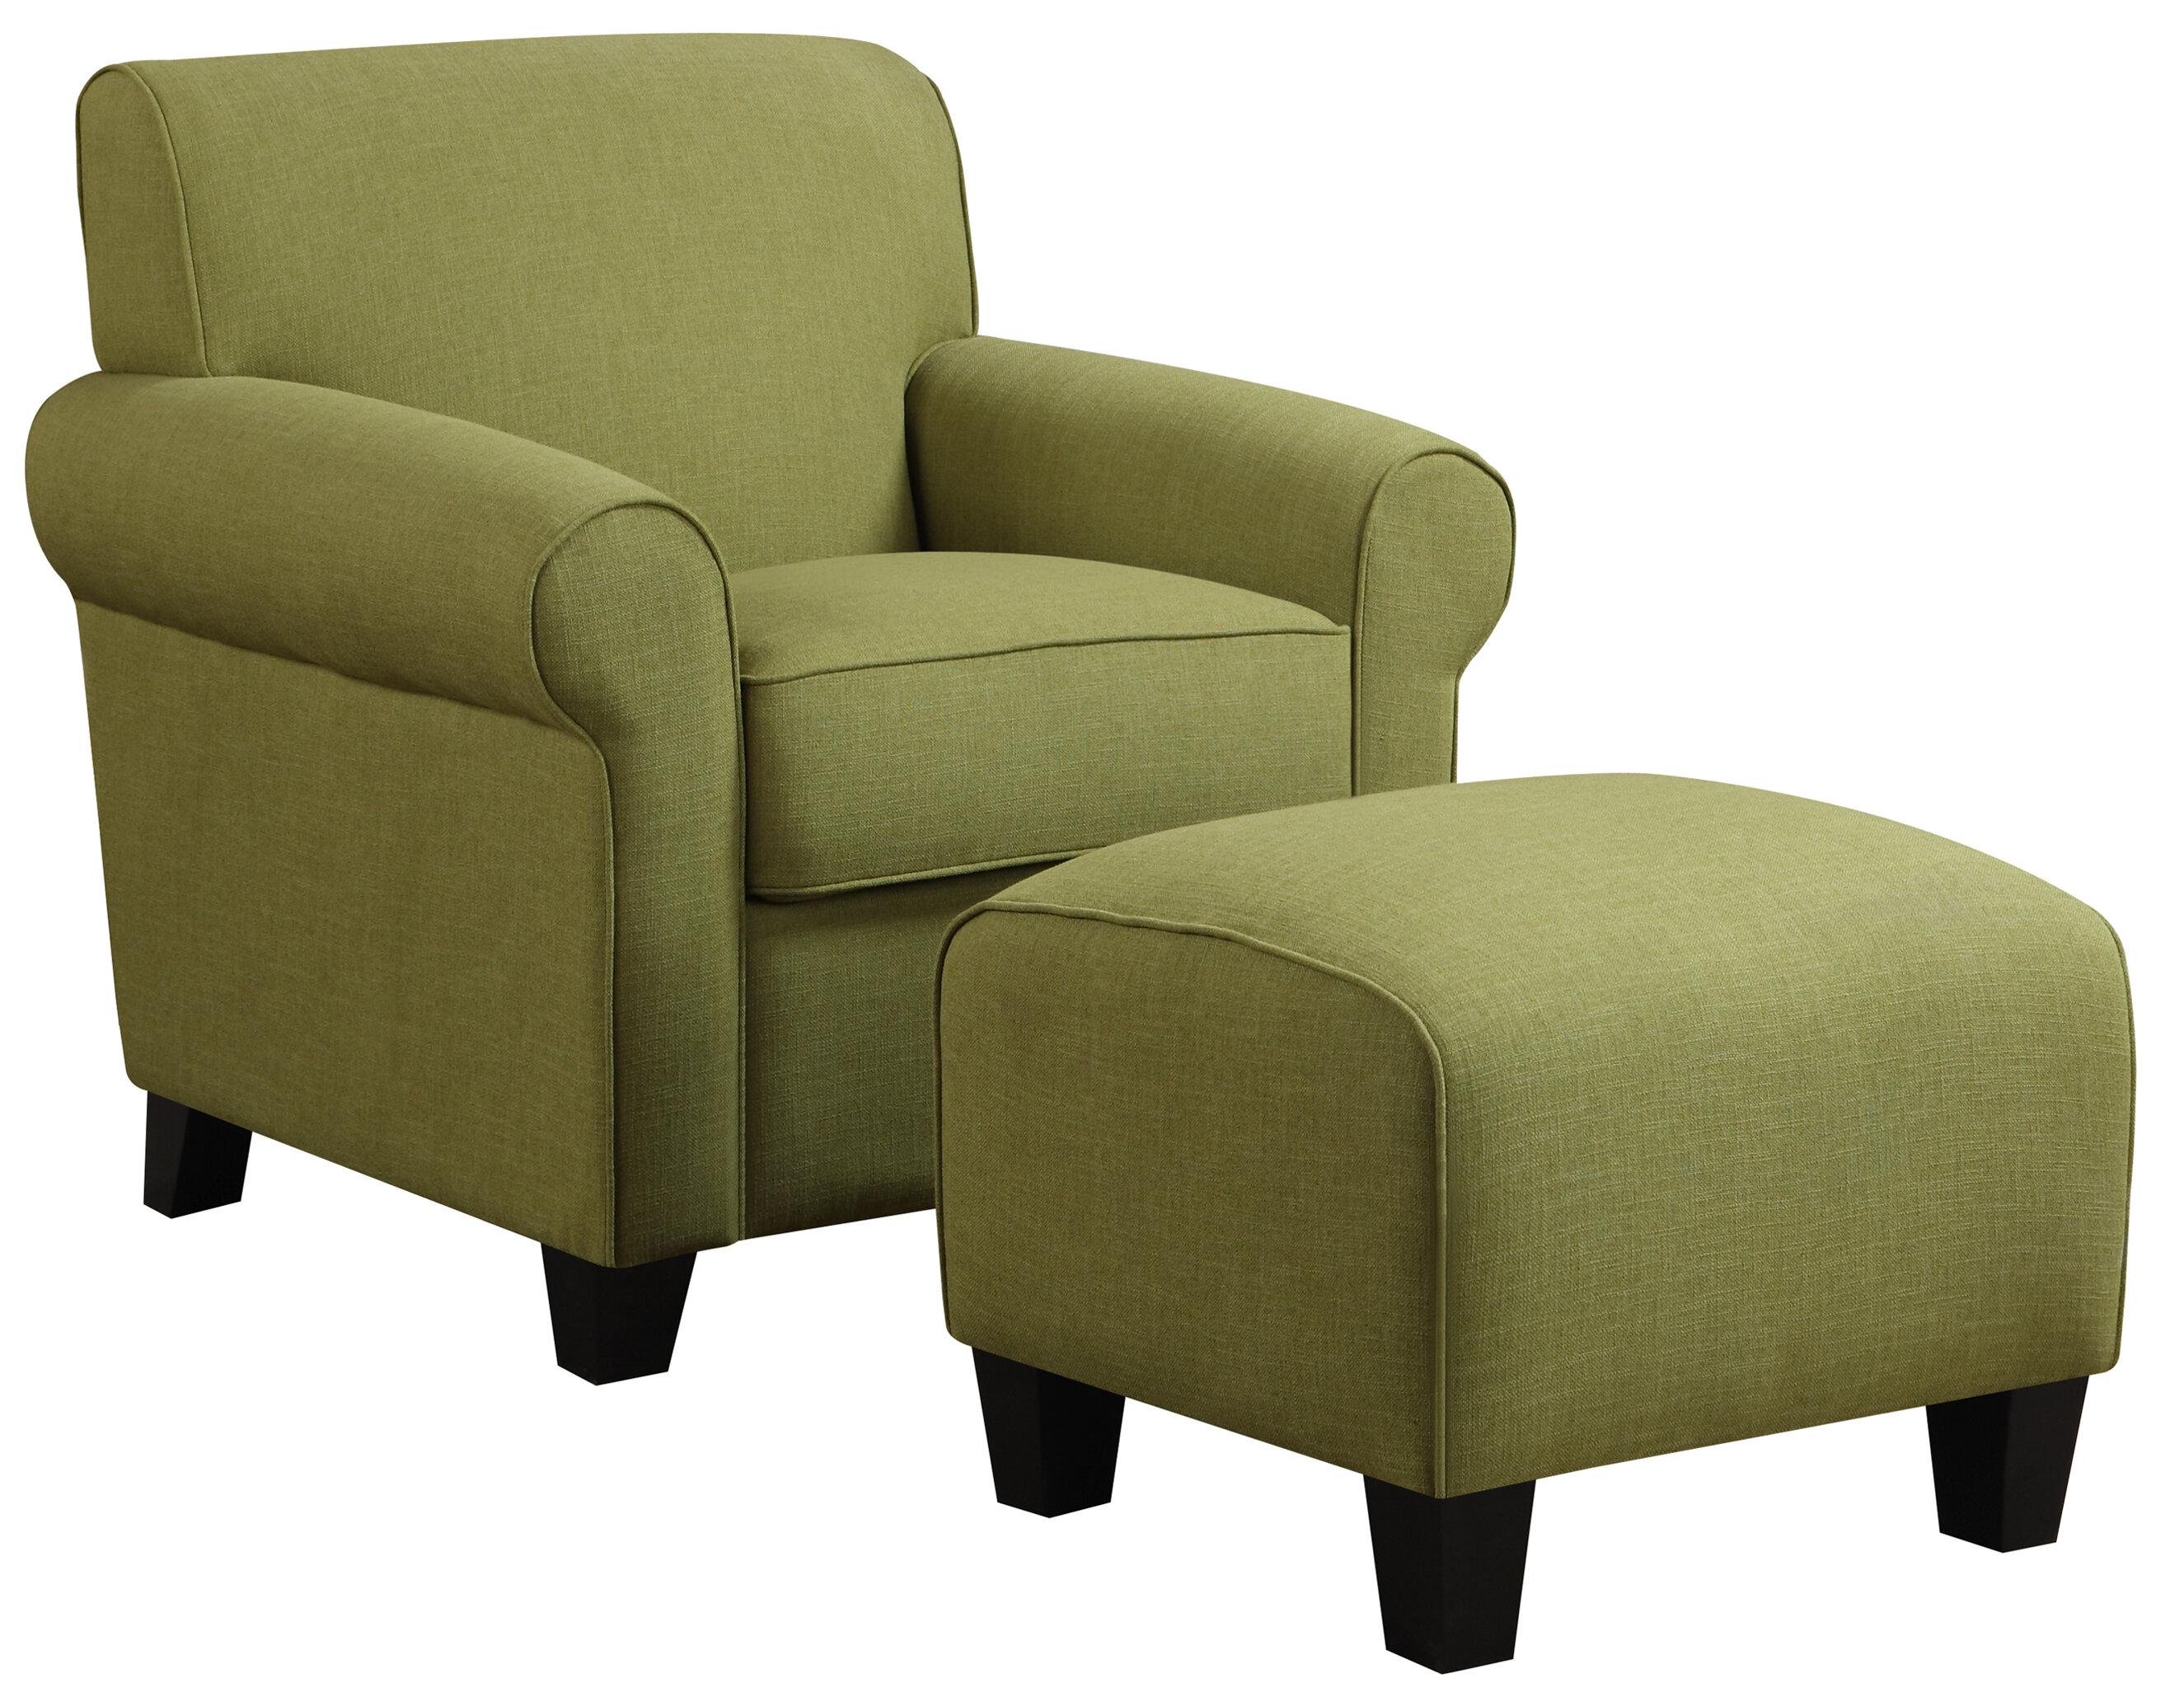 Alcott Hill Oldbury Armchair And Ottoman U0026 Reviews | Wayfair